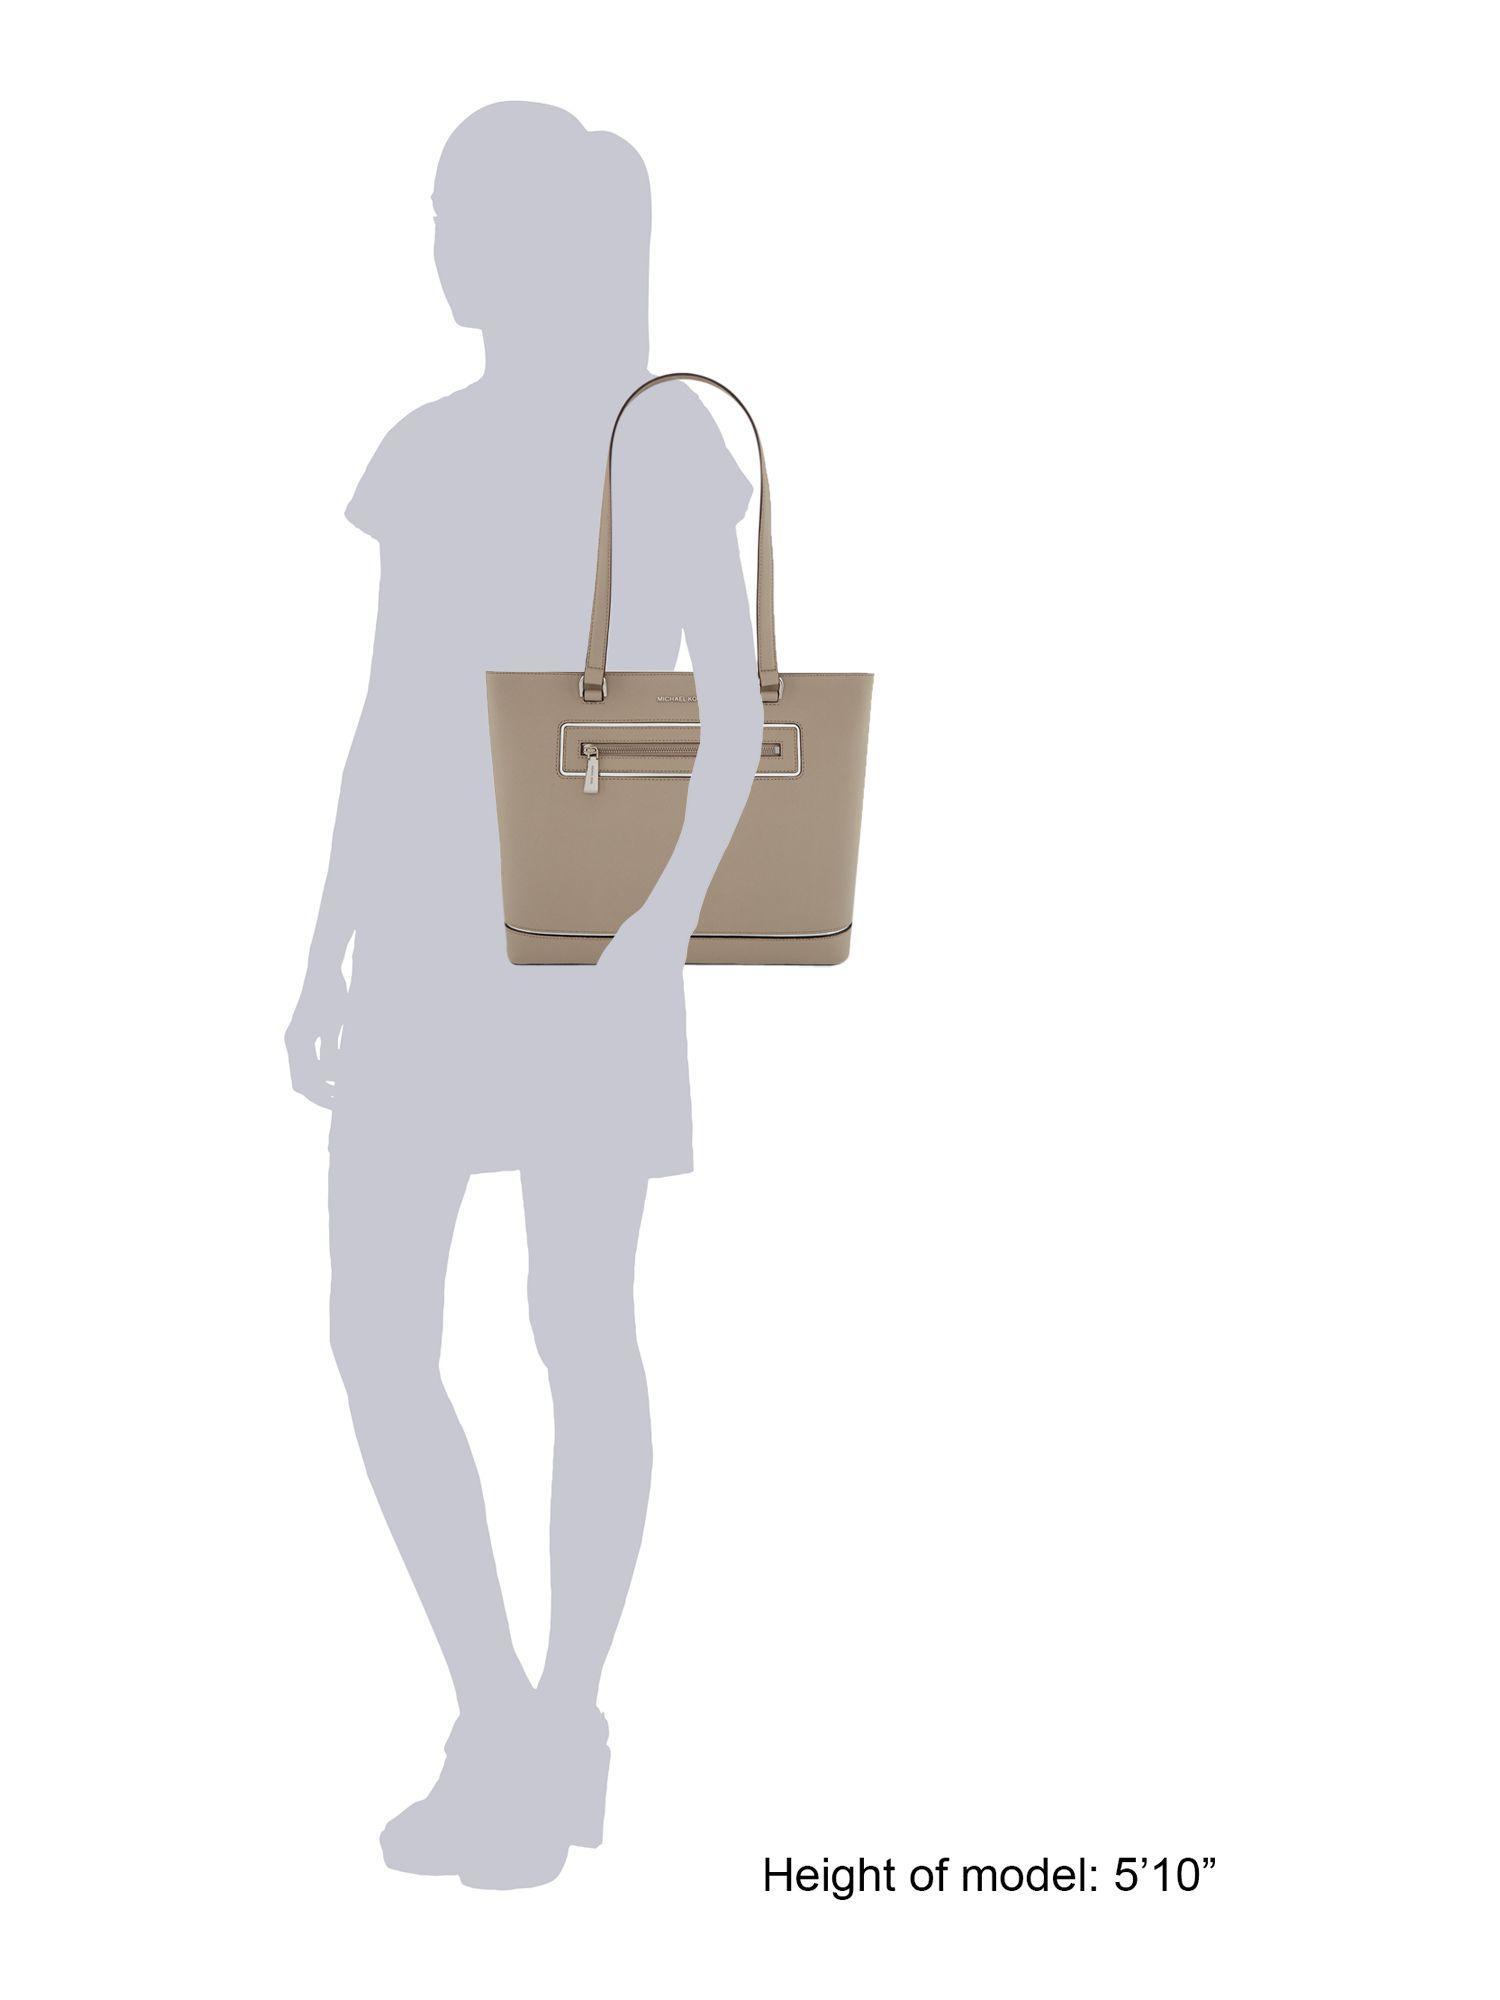 Michael Kors Frame Out Item Grey Large Tote Bag in Grey